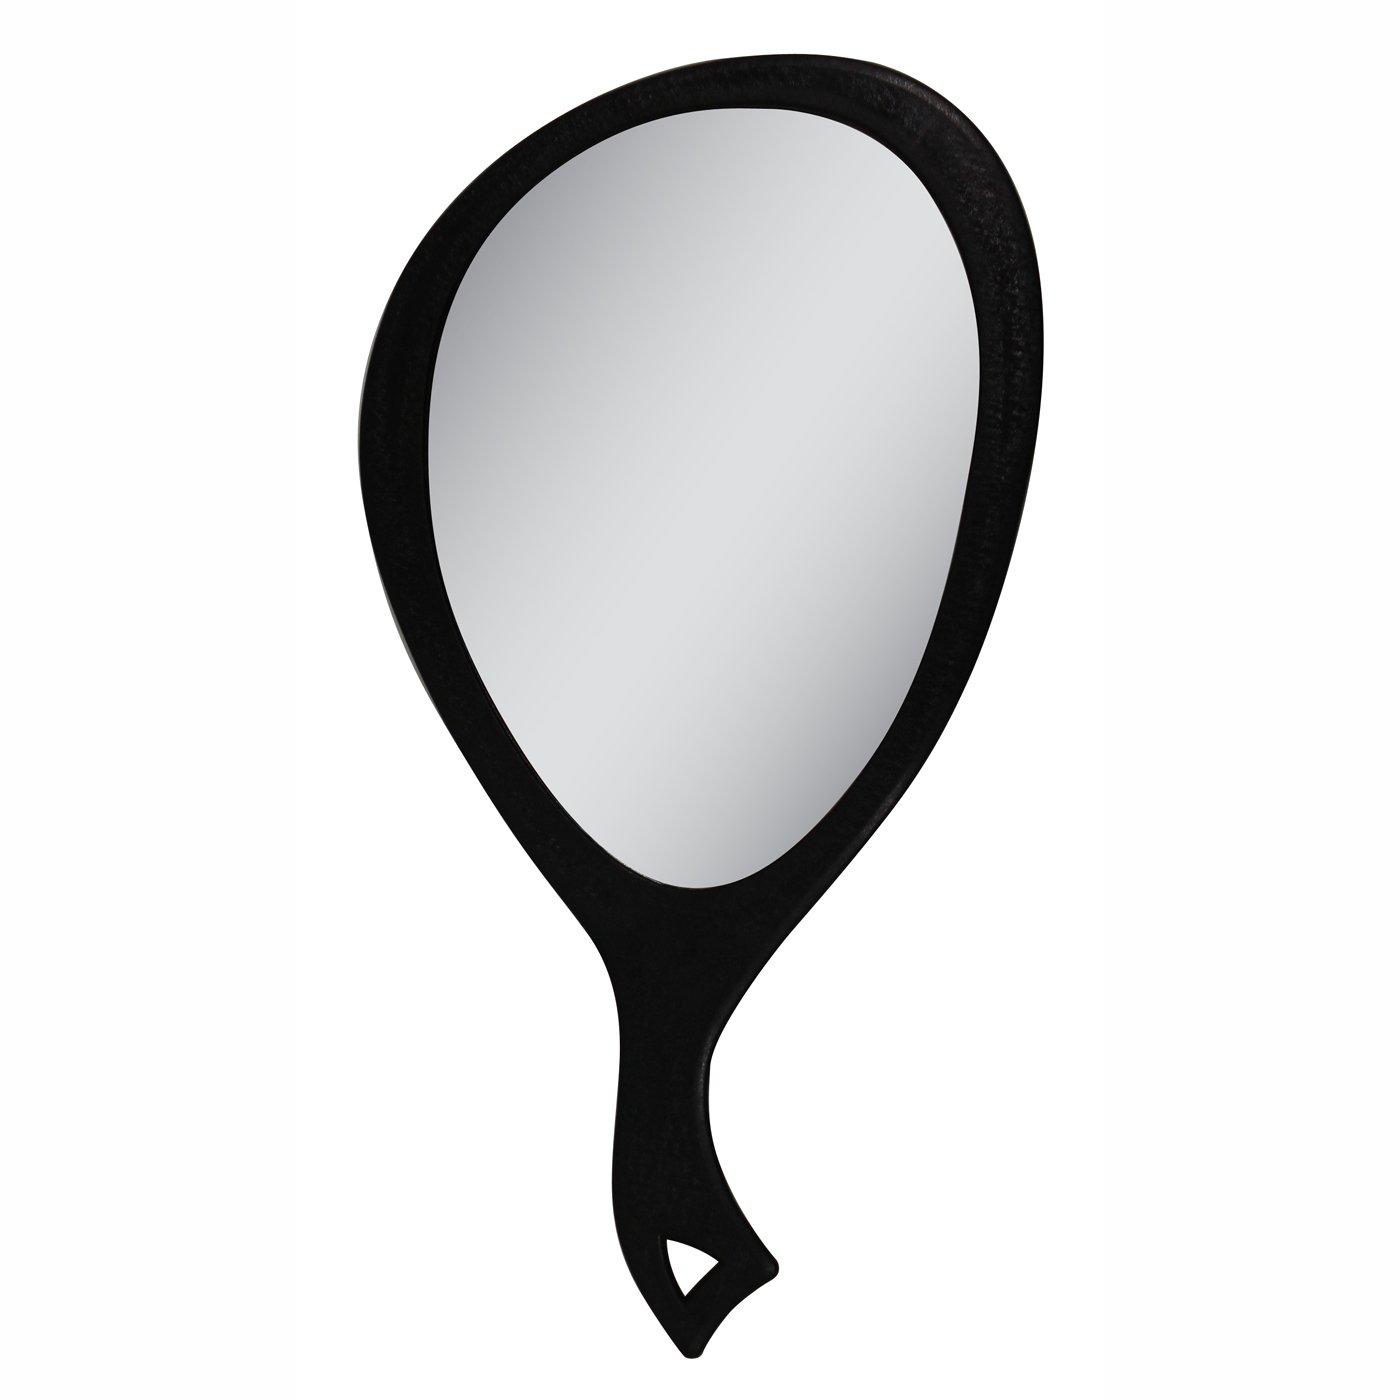 Hand Held Mirror Clipart Handheld Mirror Clipart